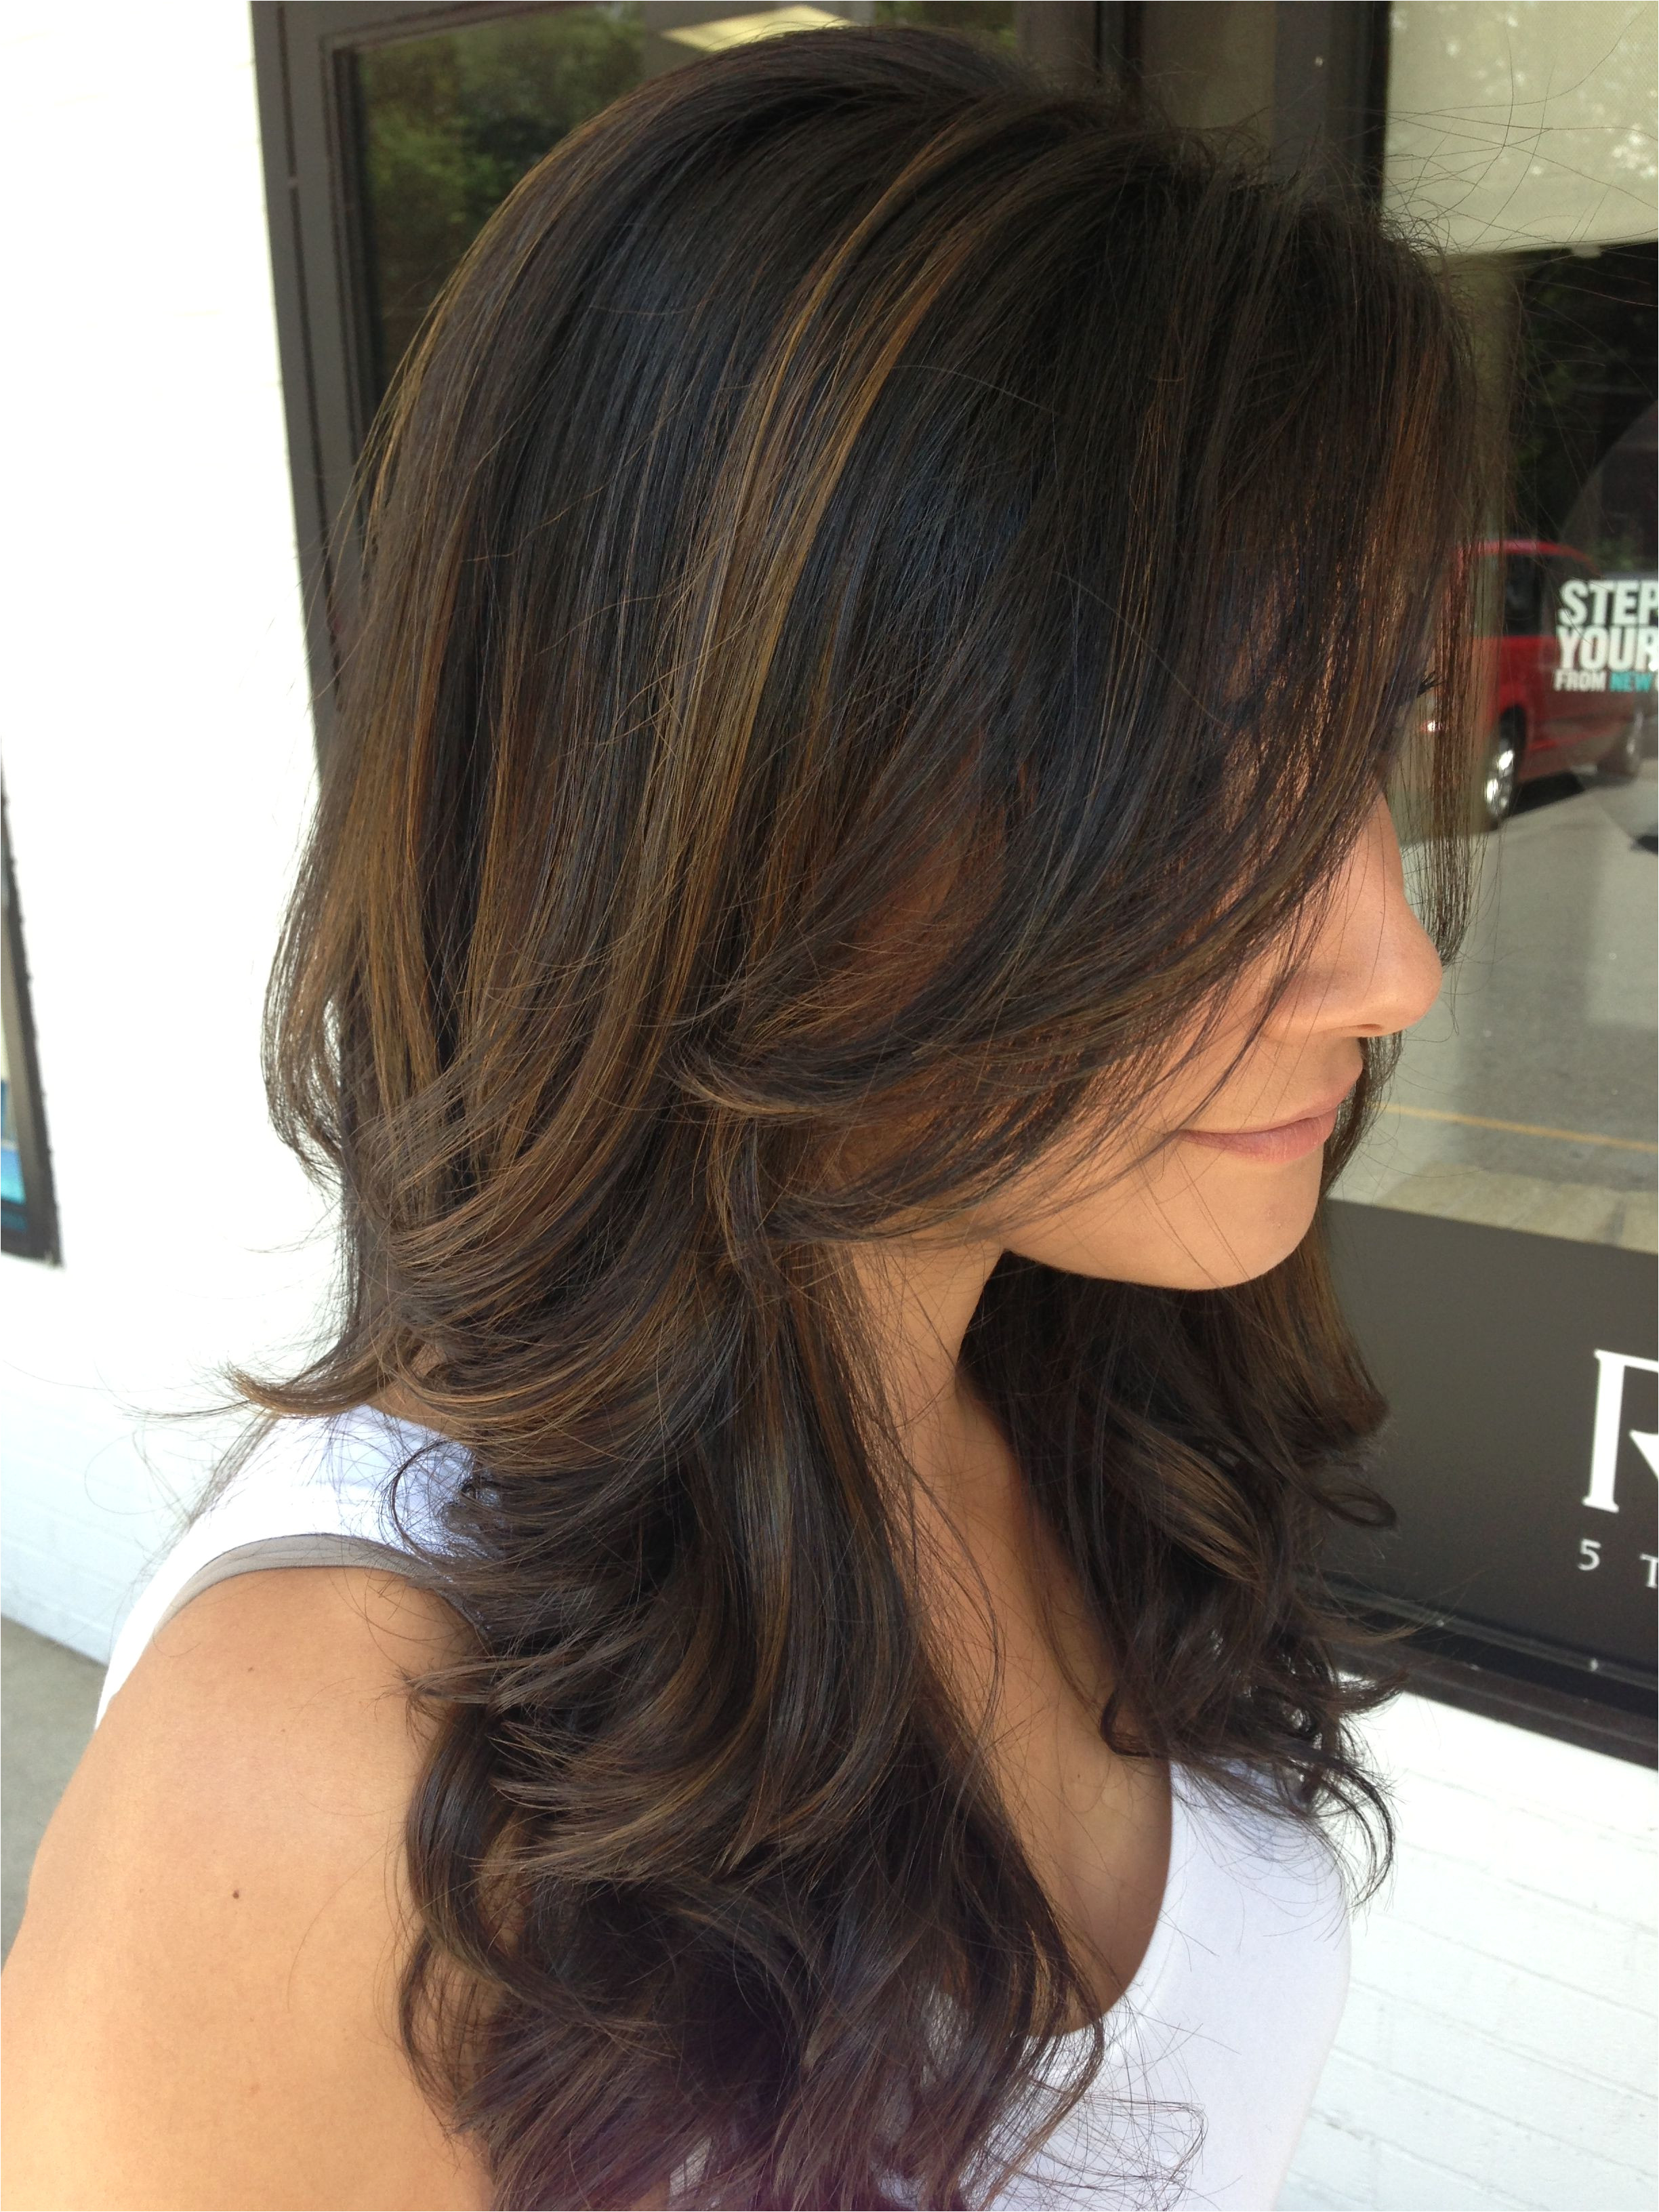 Light brown highlights salon877 work done by Clarissa